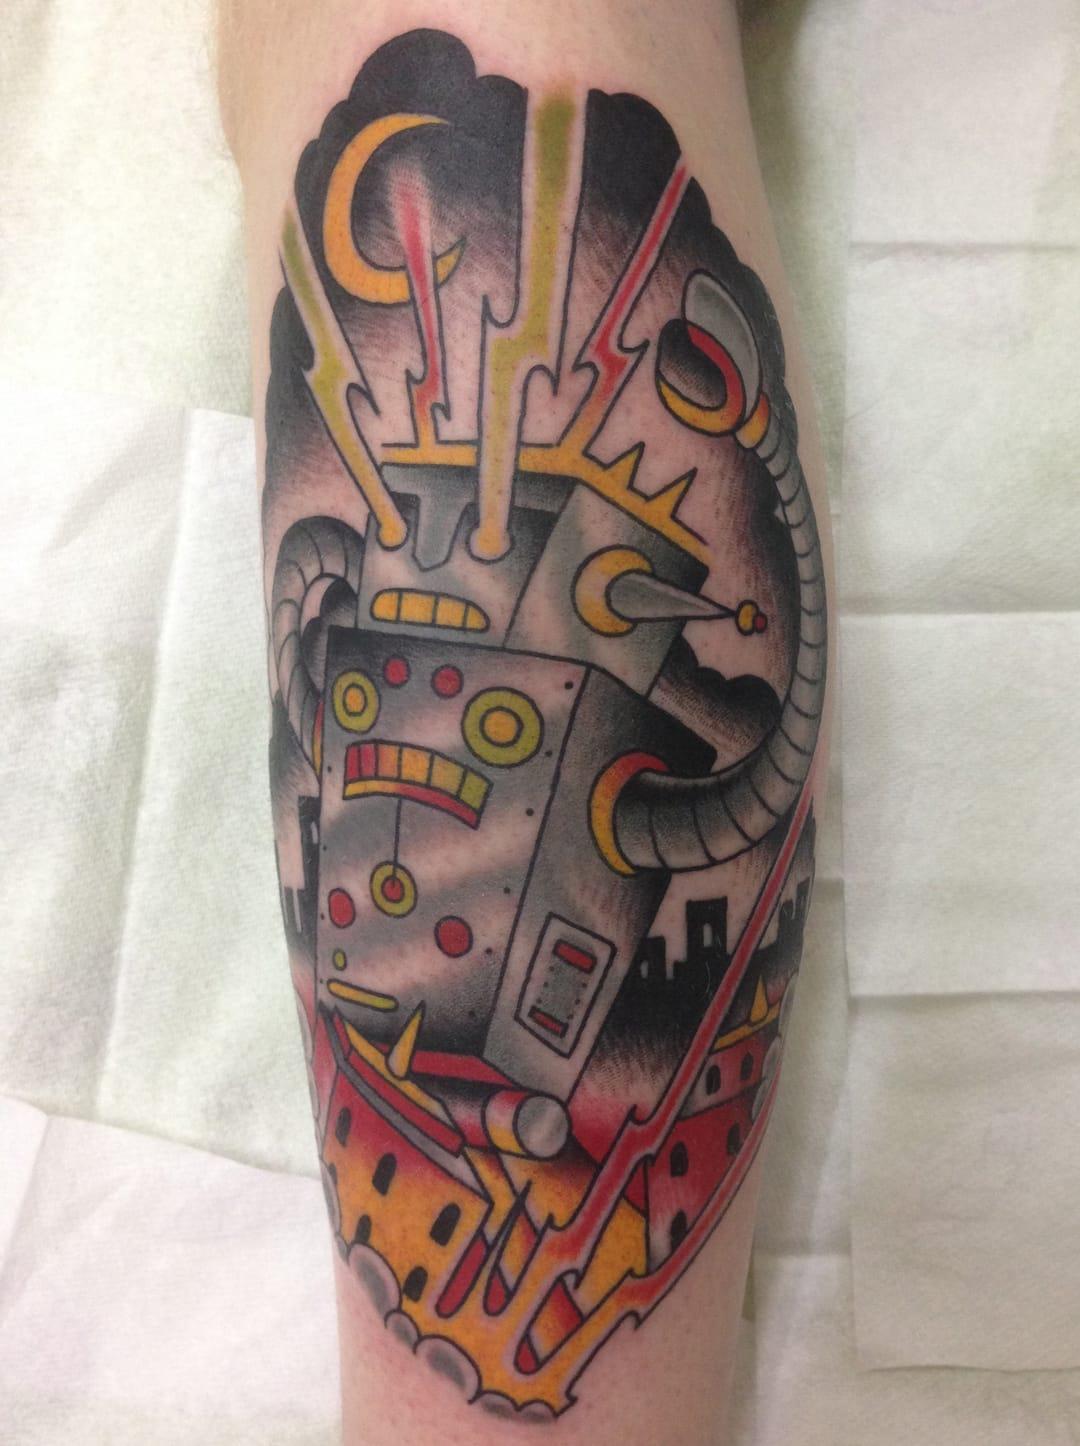 Love this robot tattoo by Elektrisk Tatovering Denmark